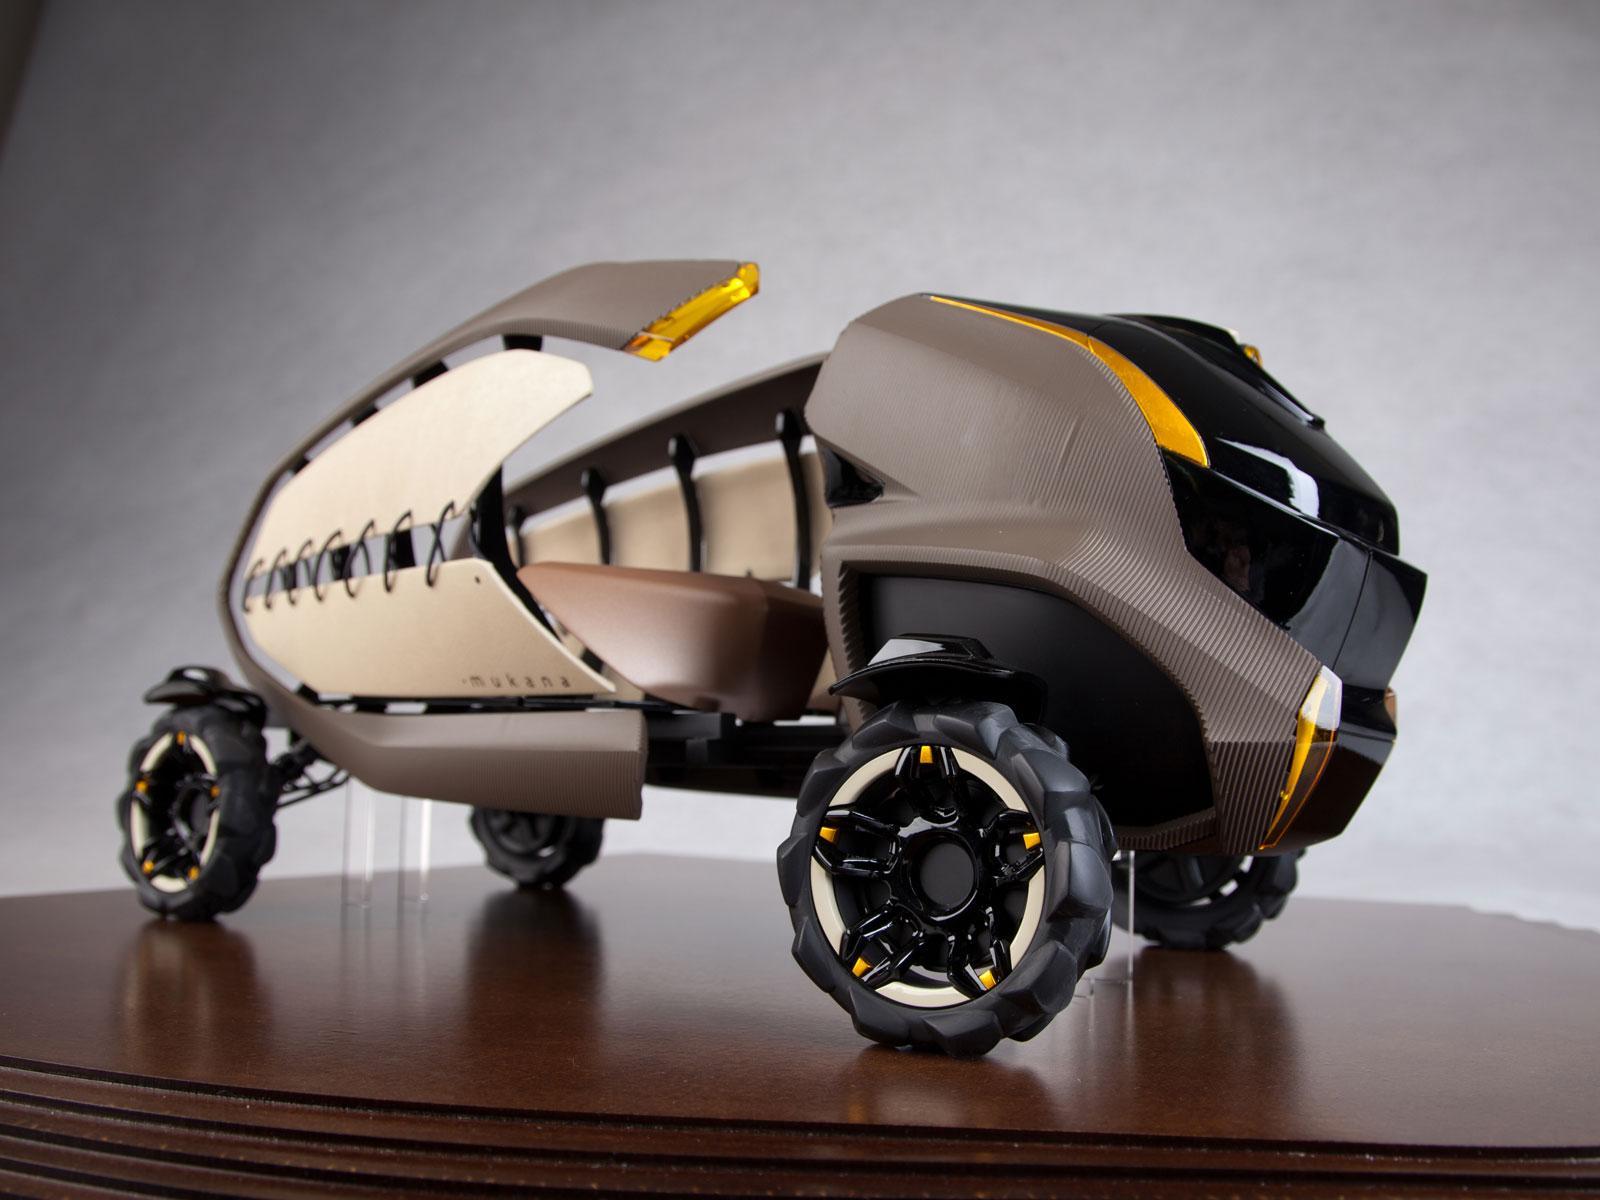 Mukana-Concept-scale-model-03.jpg (1600×1200)